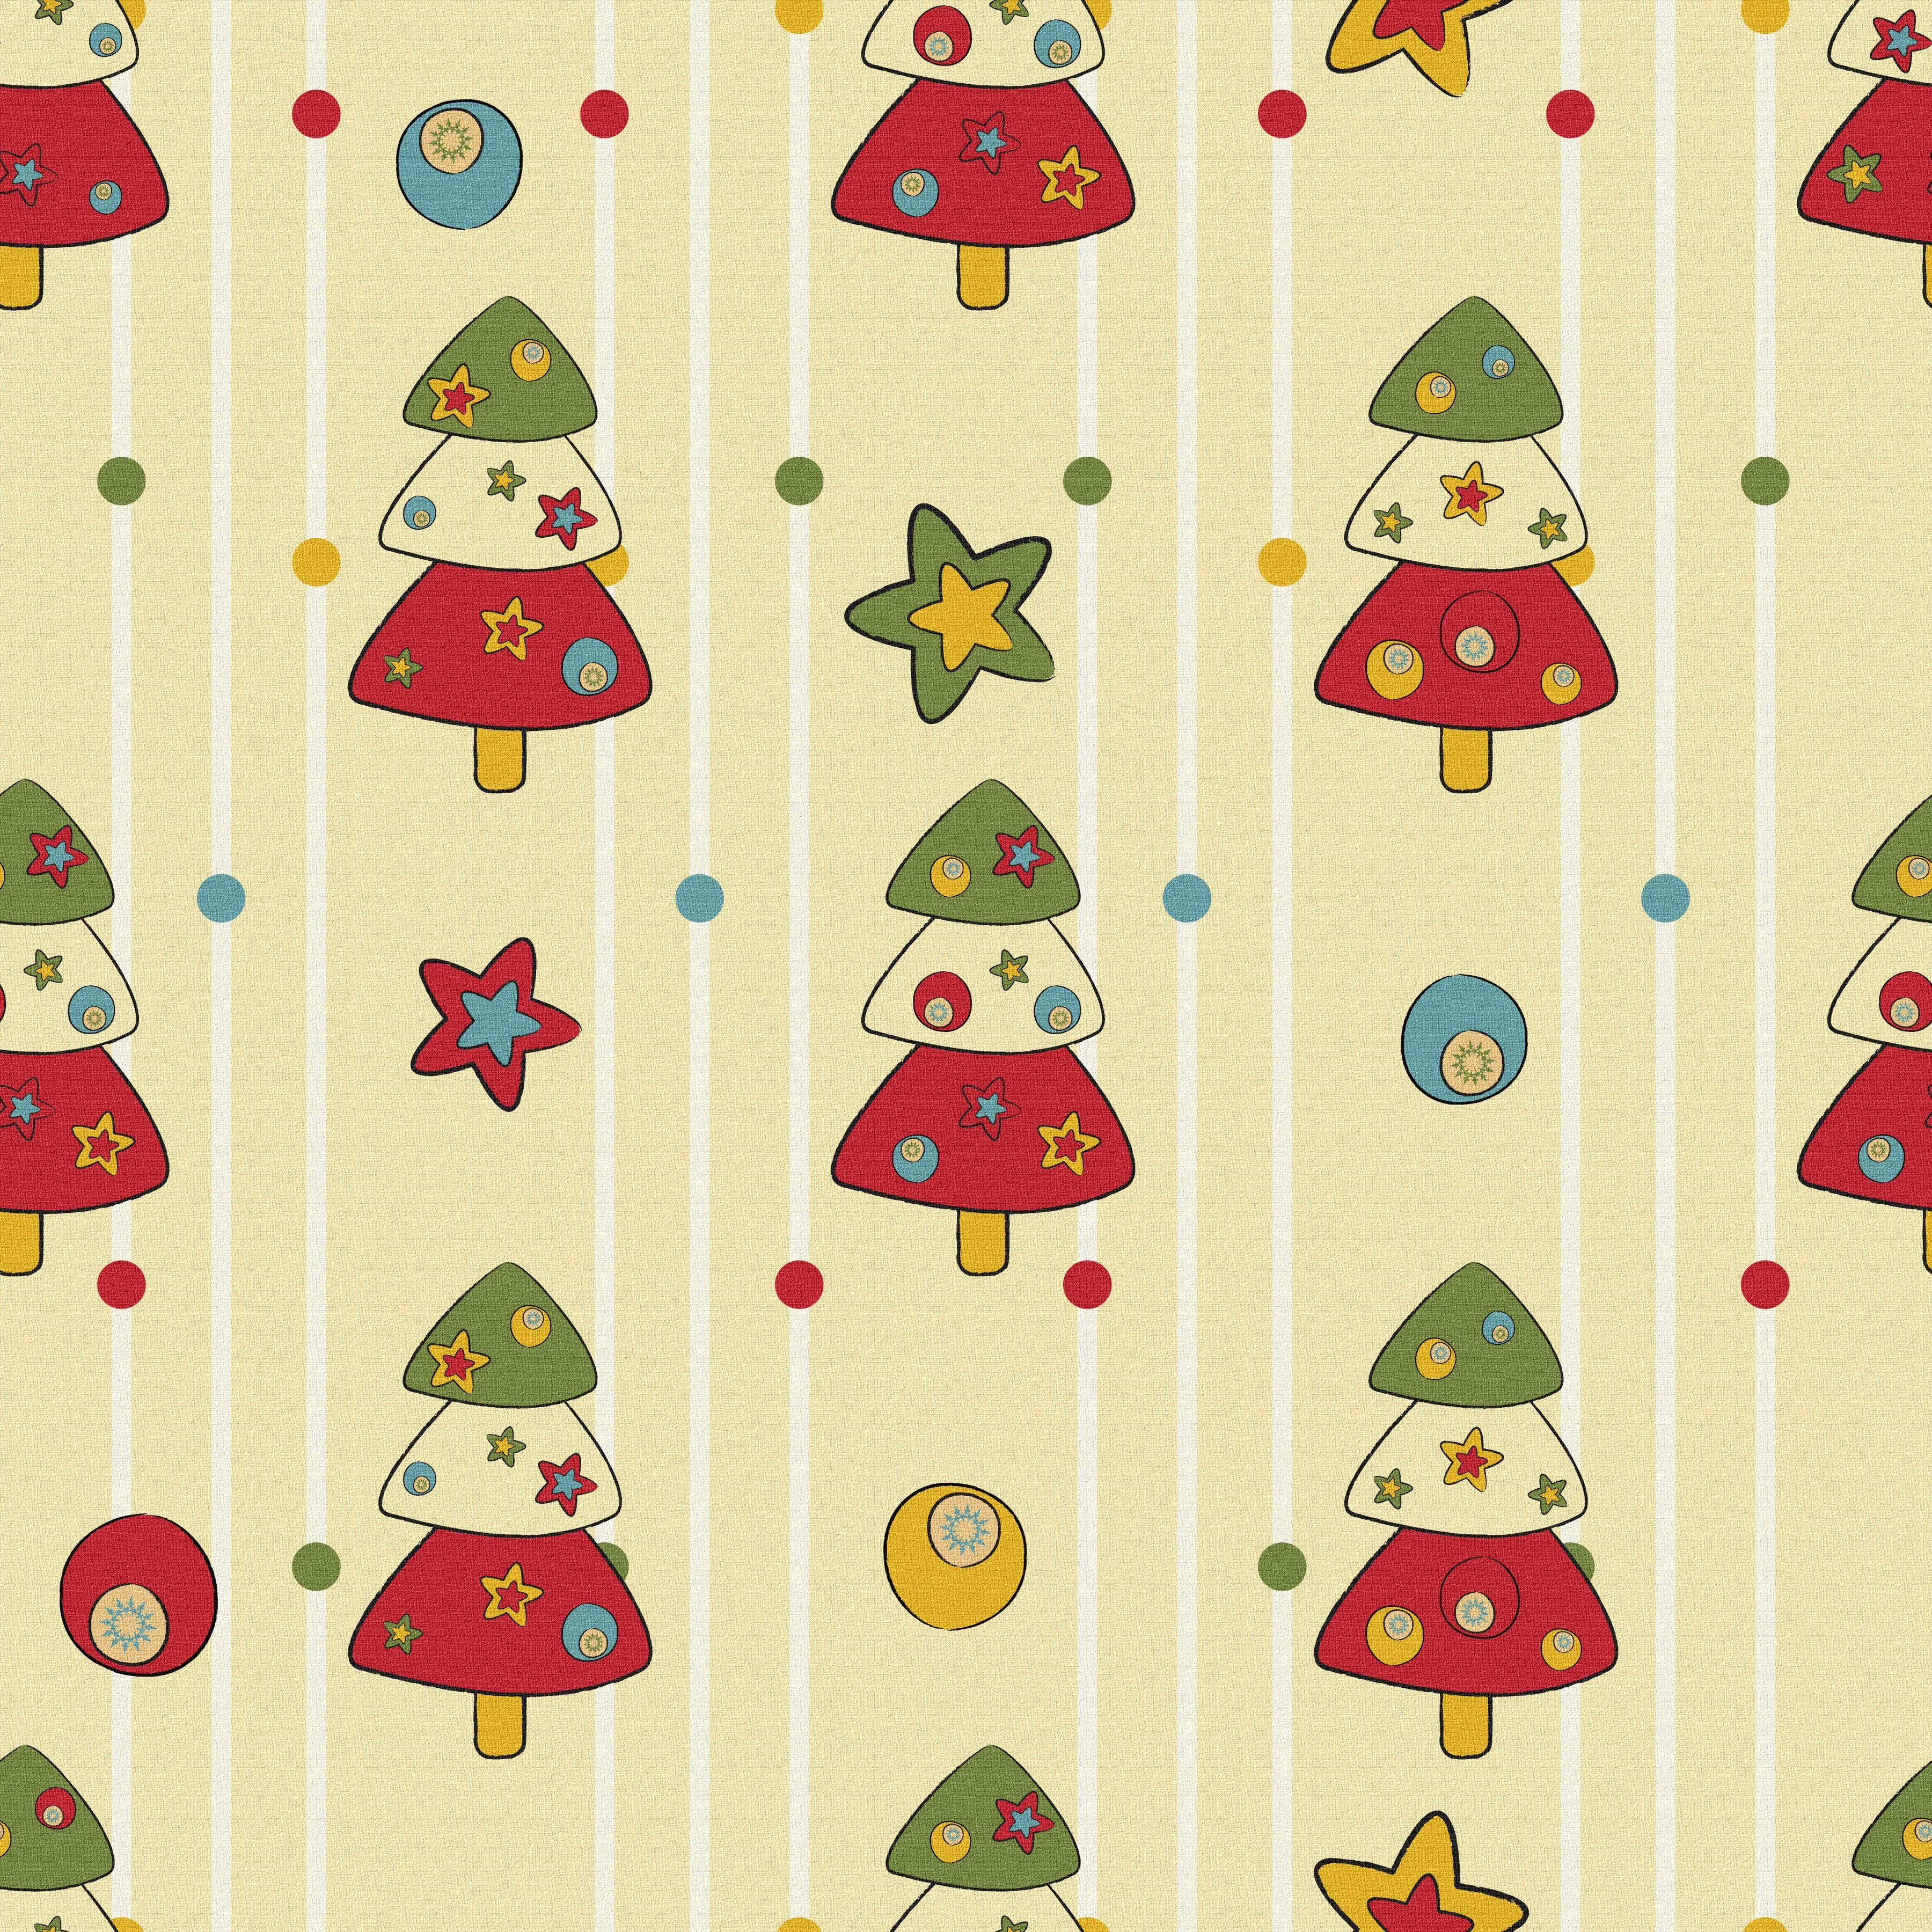 Nadal Fons Paper  Petitm N Recursos  Lbuns Da